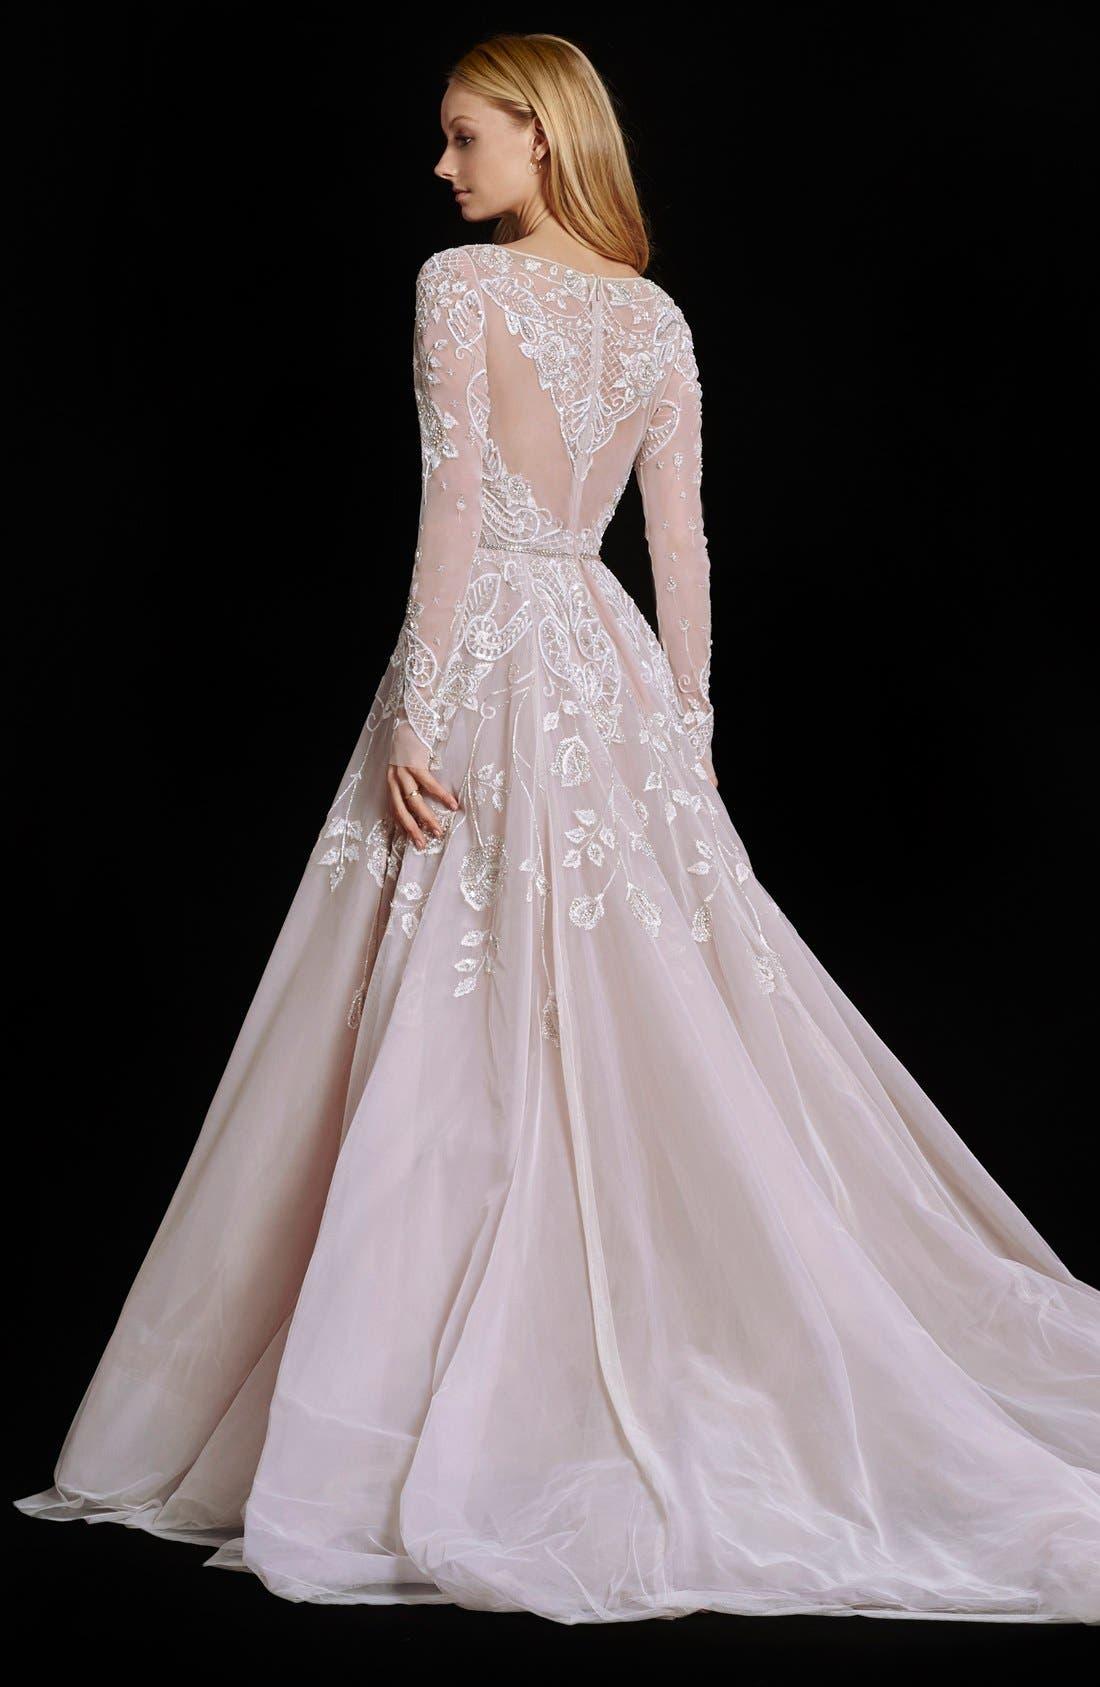 508a4e240d3c Hayley Paige Wedding Dresses & Bridal Gowns | Nordstrom